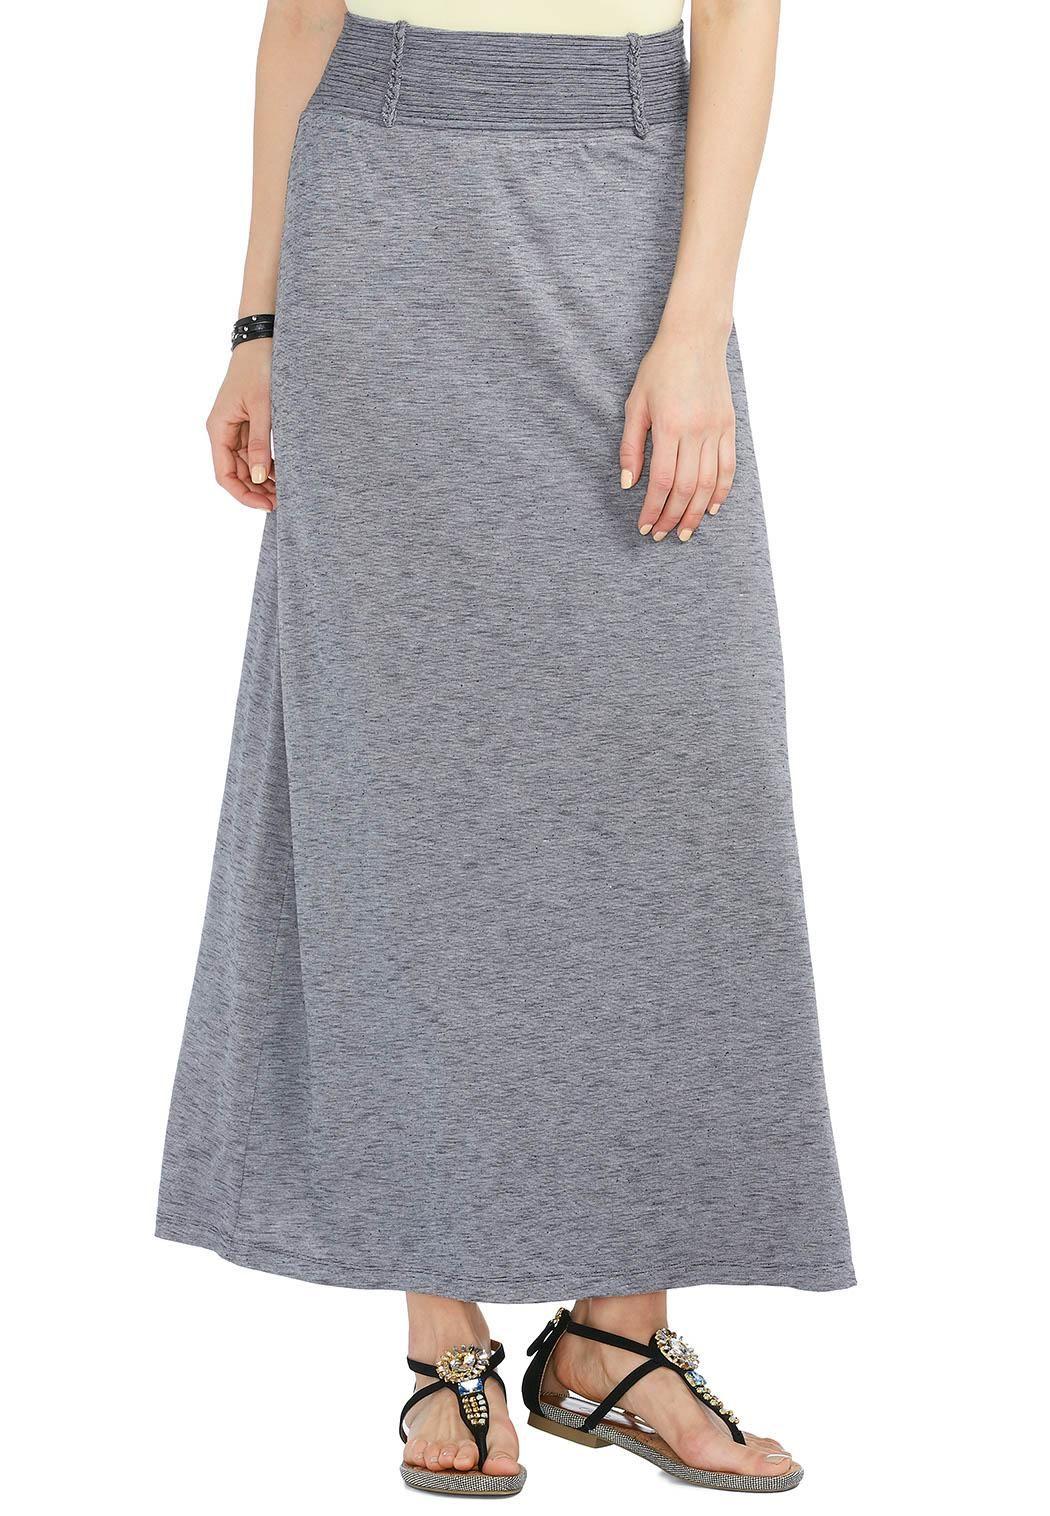 139752368f4 Textured Slub Knit Maxi Skirt-Plus Skirts Cato Fashions